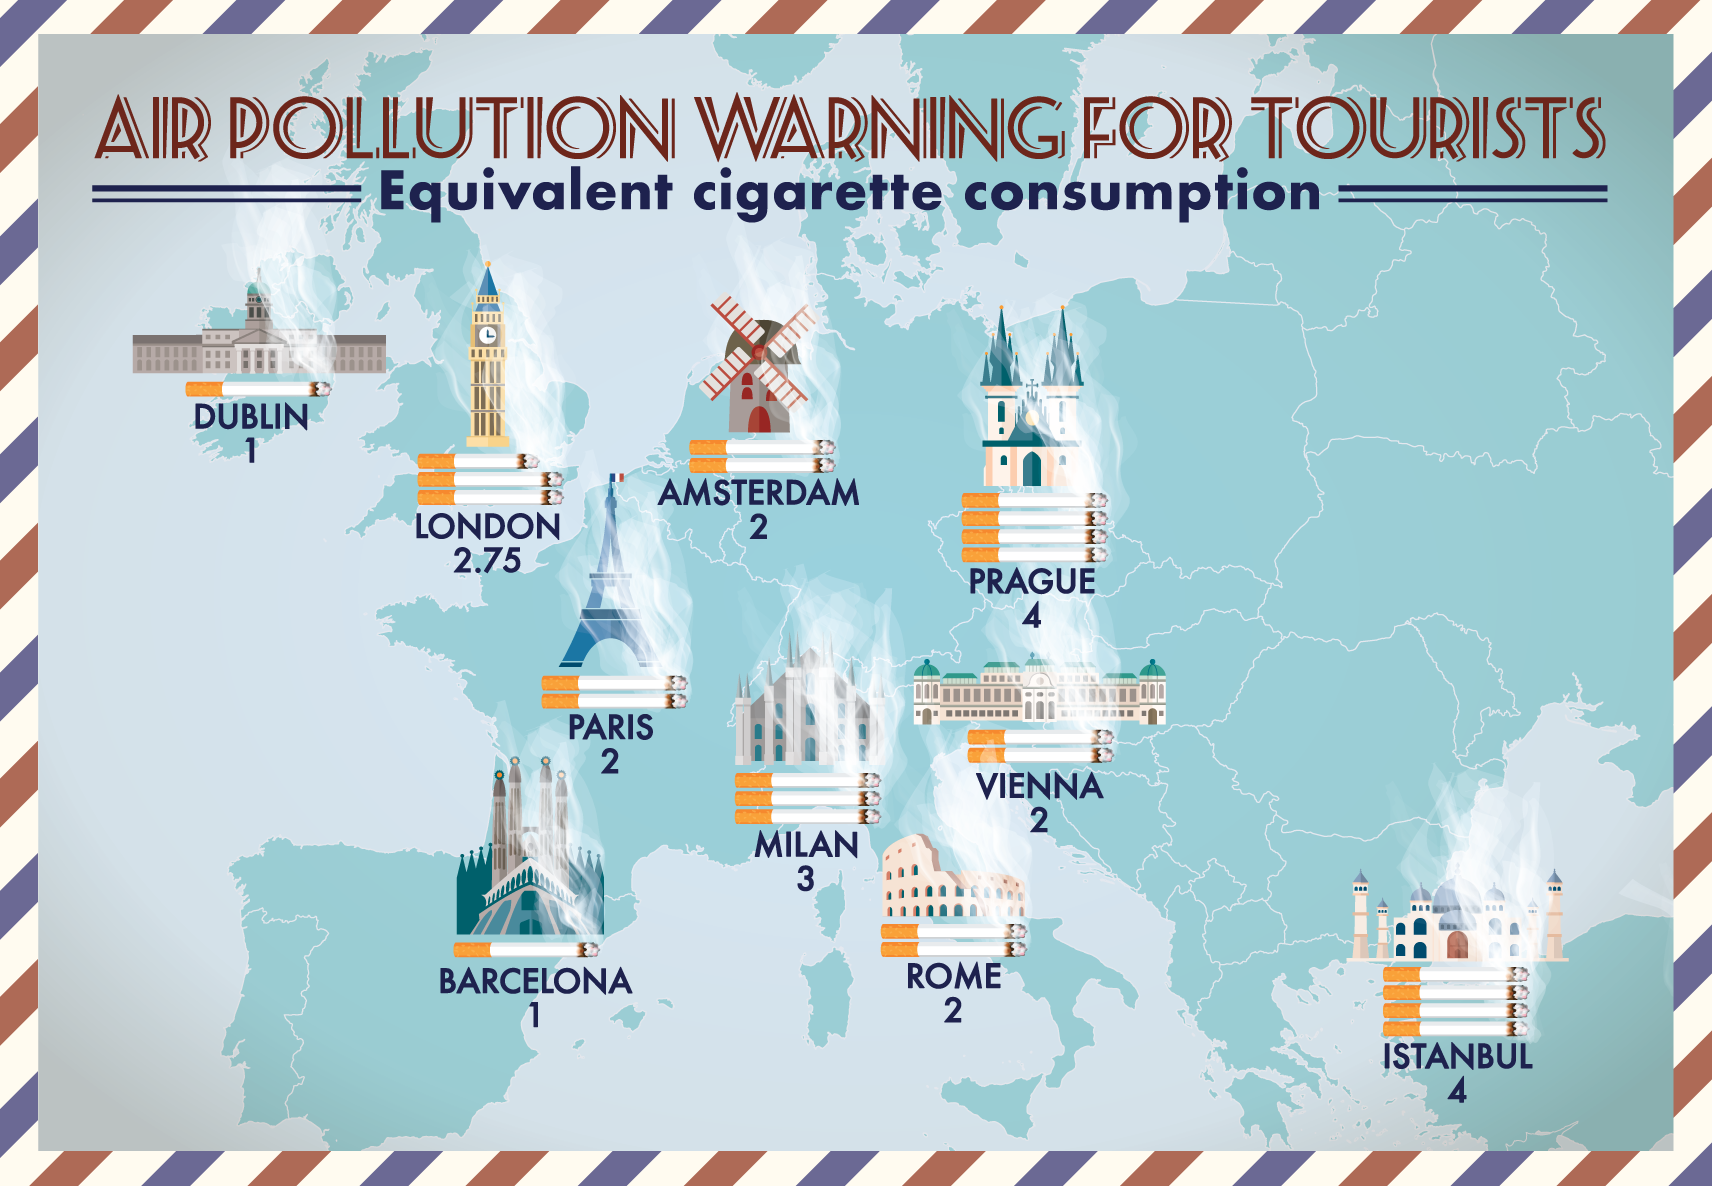 Smoked cigarettes per city - Transport & Environment